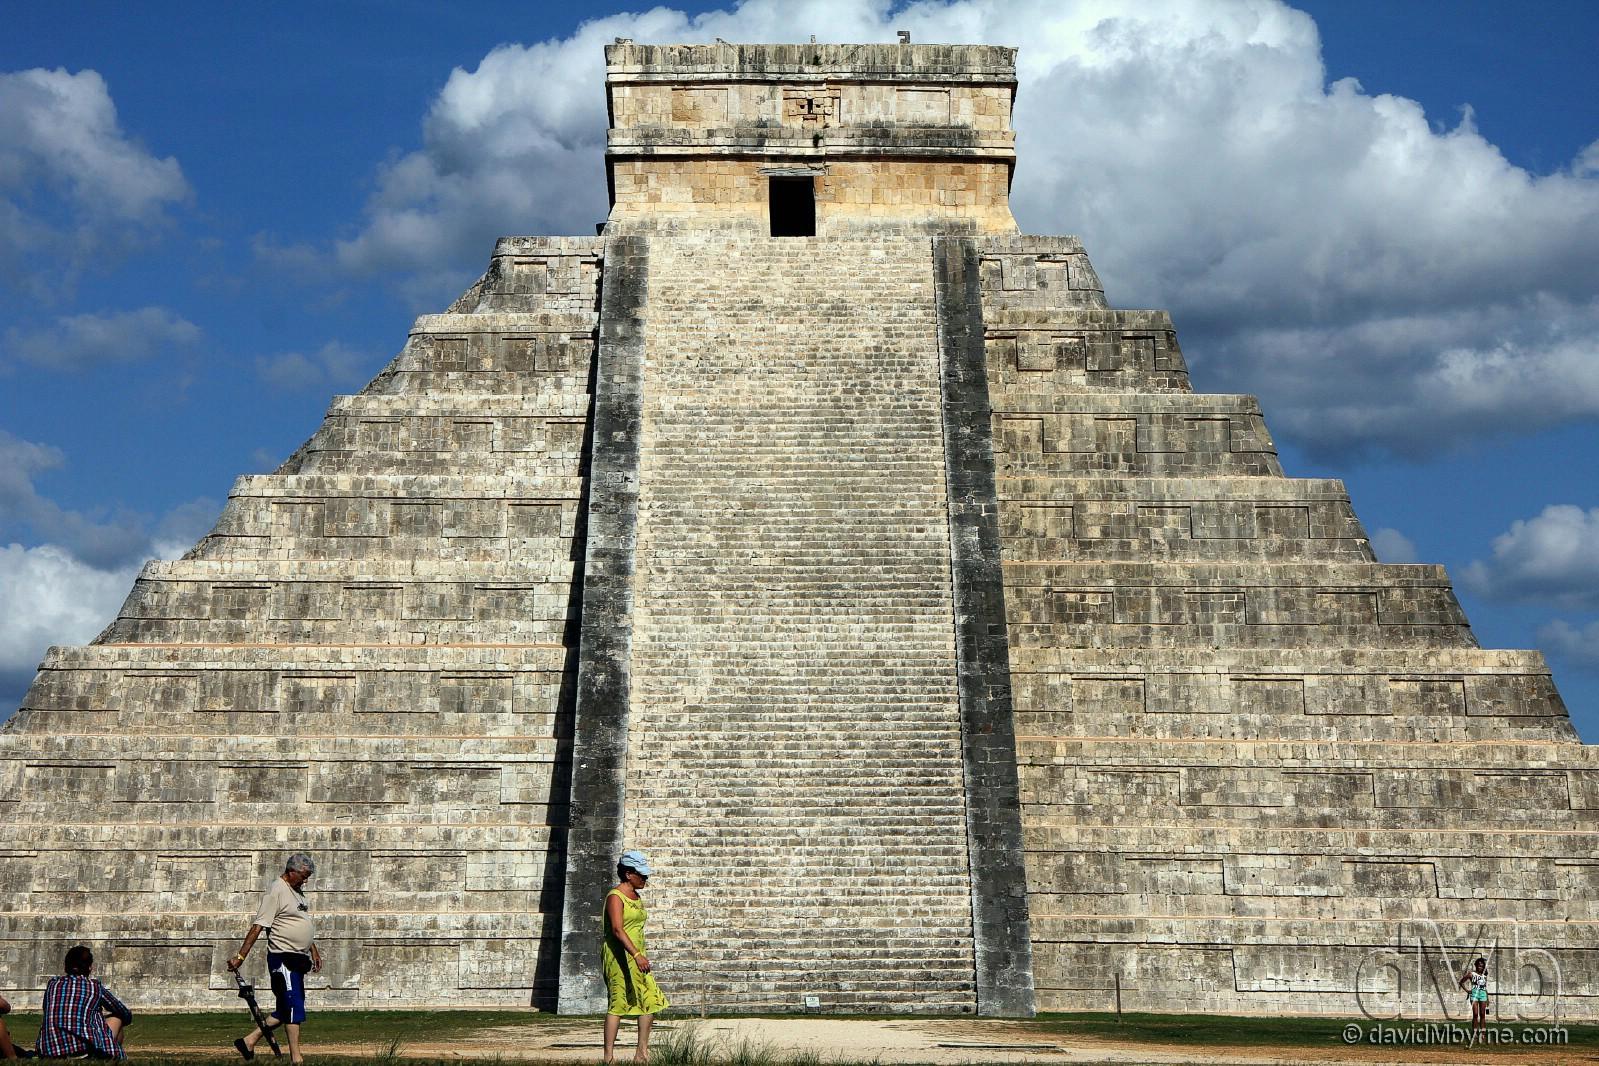 El Castillo / Pyramid of Kukulcan, Chichén Itzá, Yucatán Peninsula, Mexico. May 3rd 2013 (EOS 60D || Tamron 28-75mm || 54mm, 1/100sec, f/9.0, iso100)